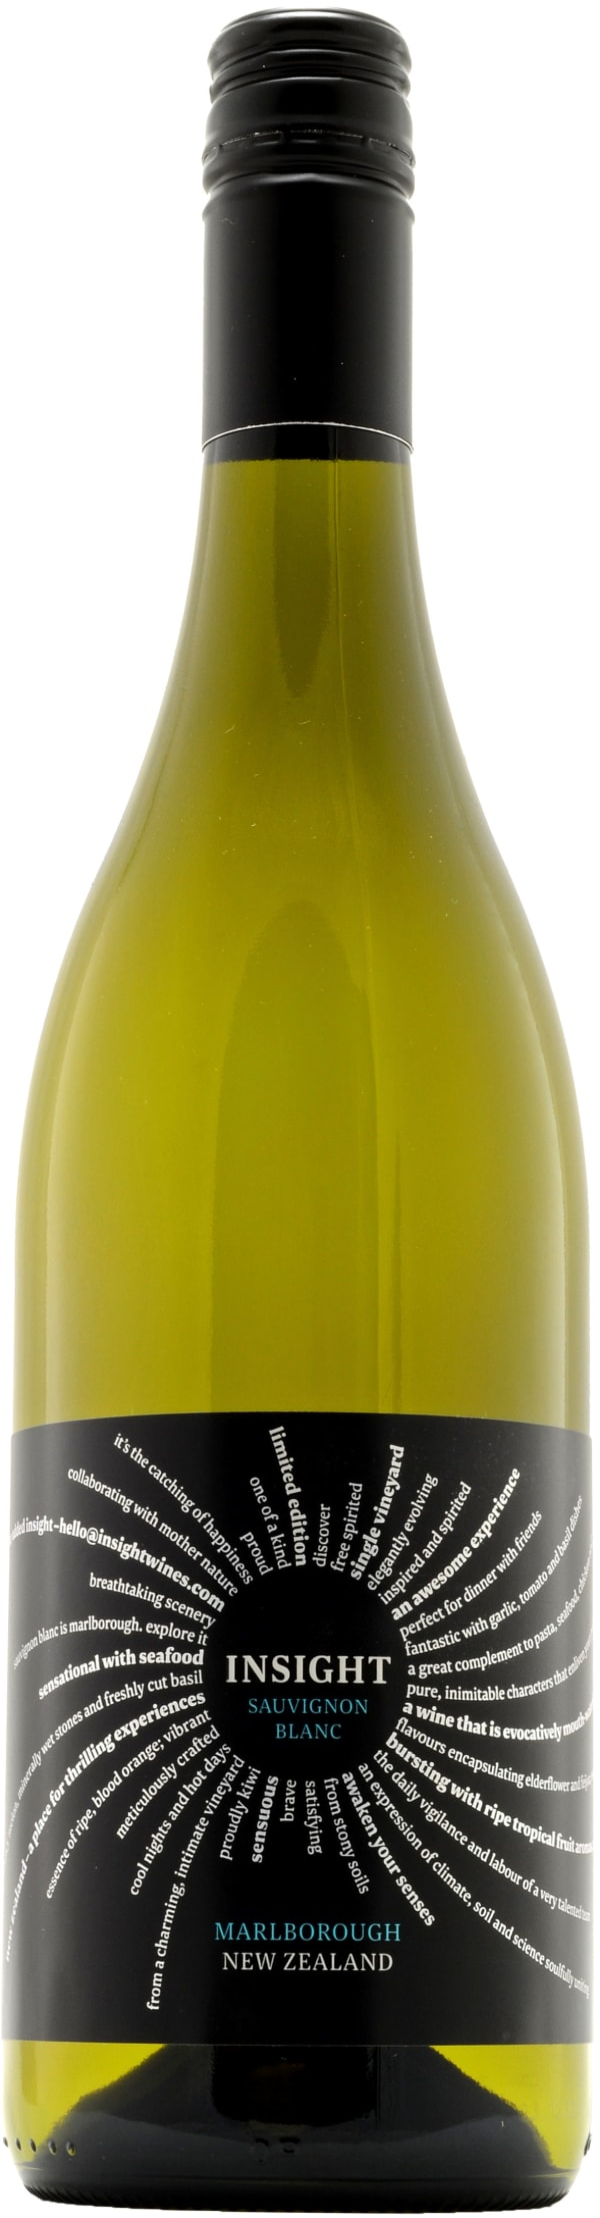 Insight Sauvignon Blanc 2016